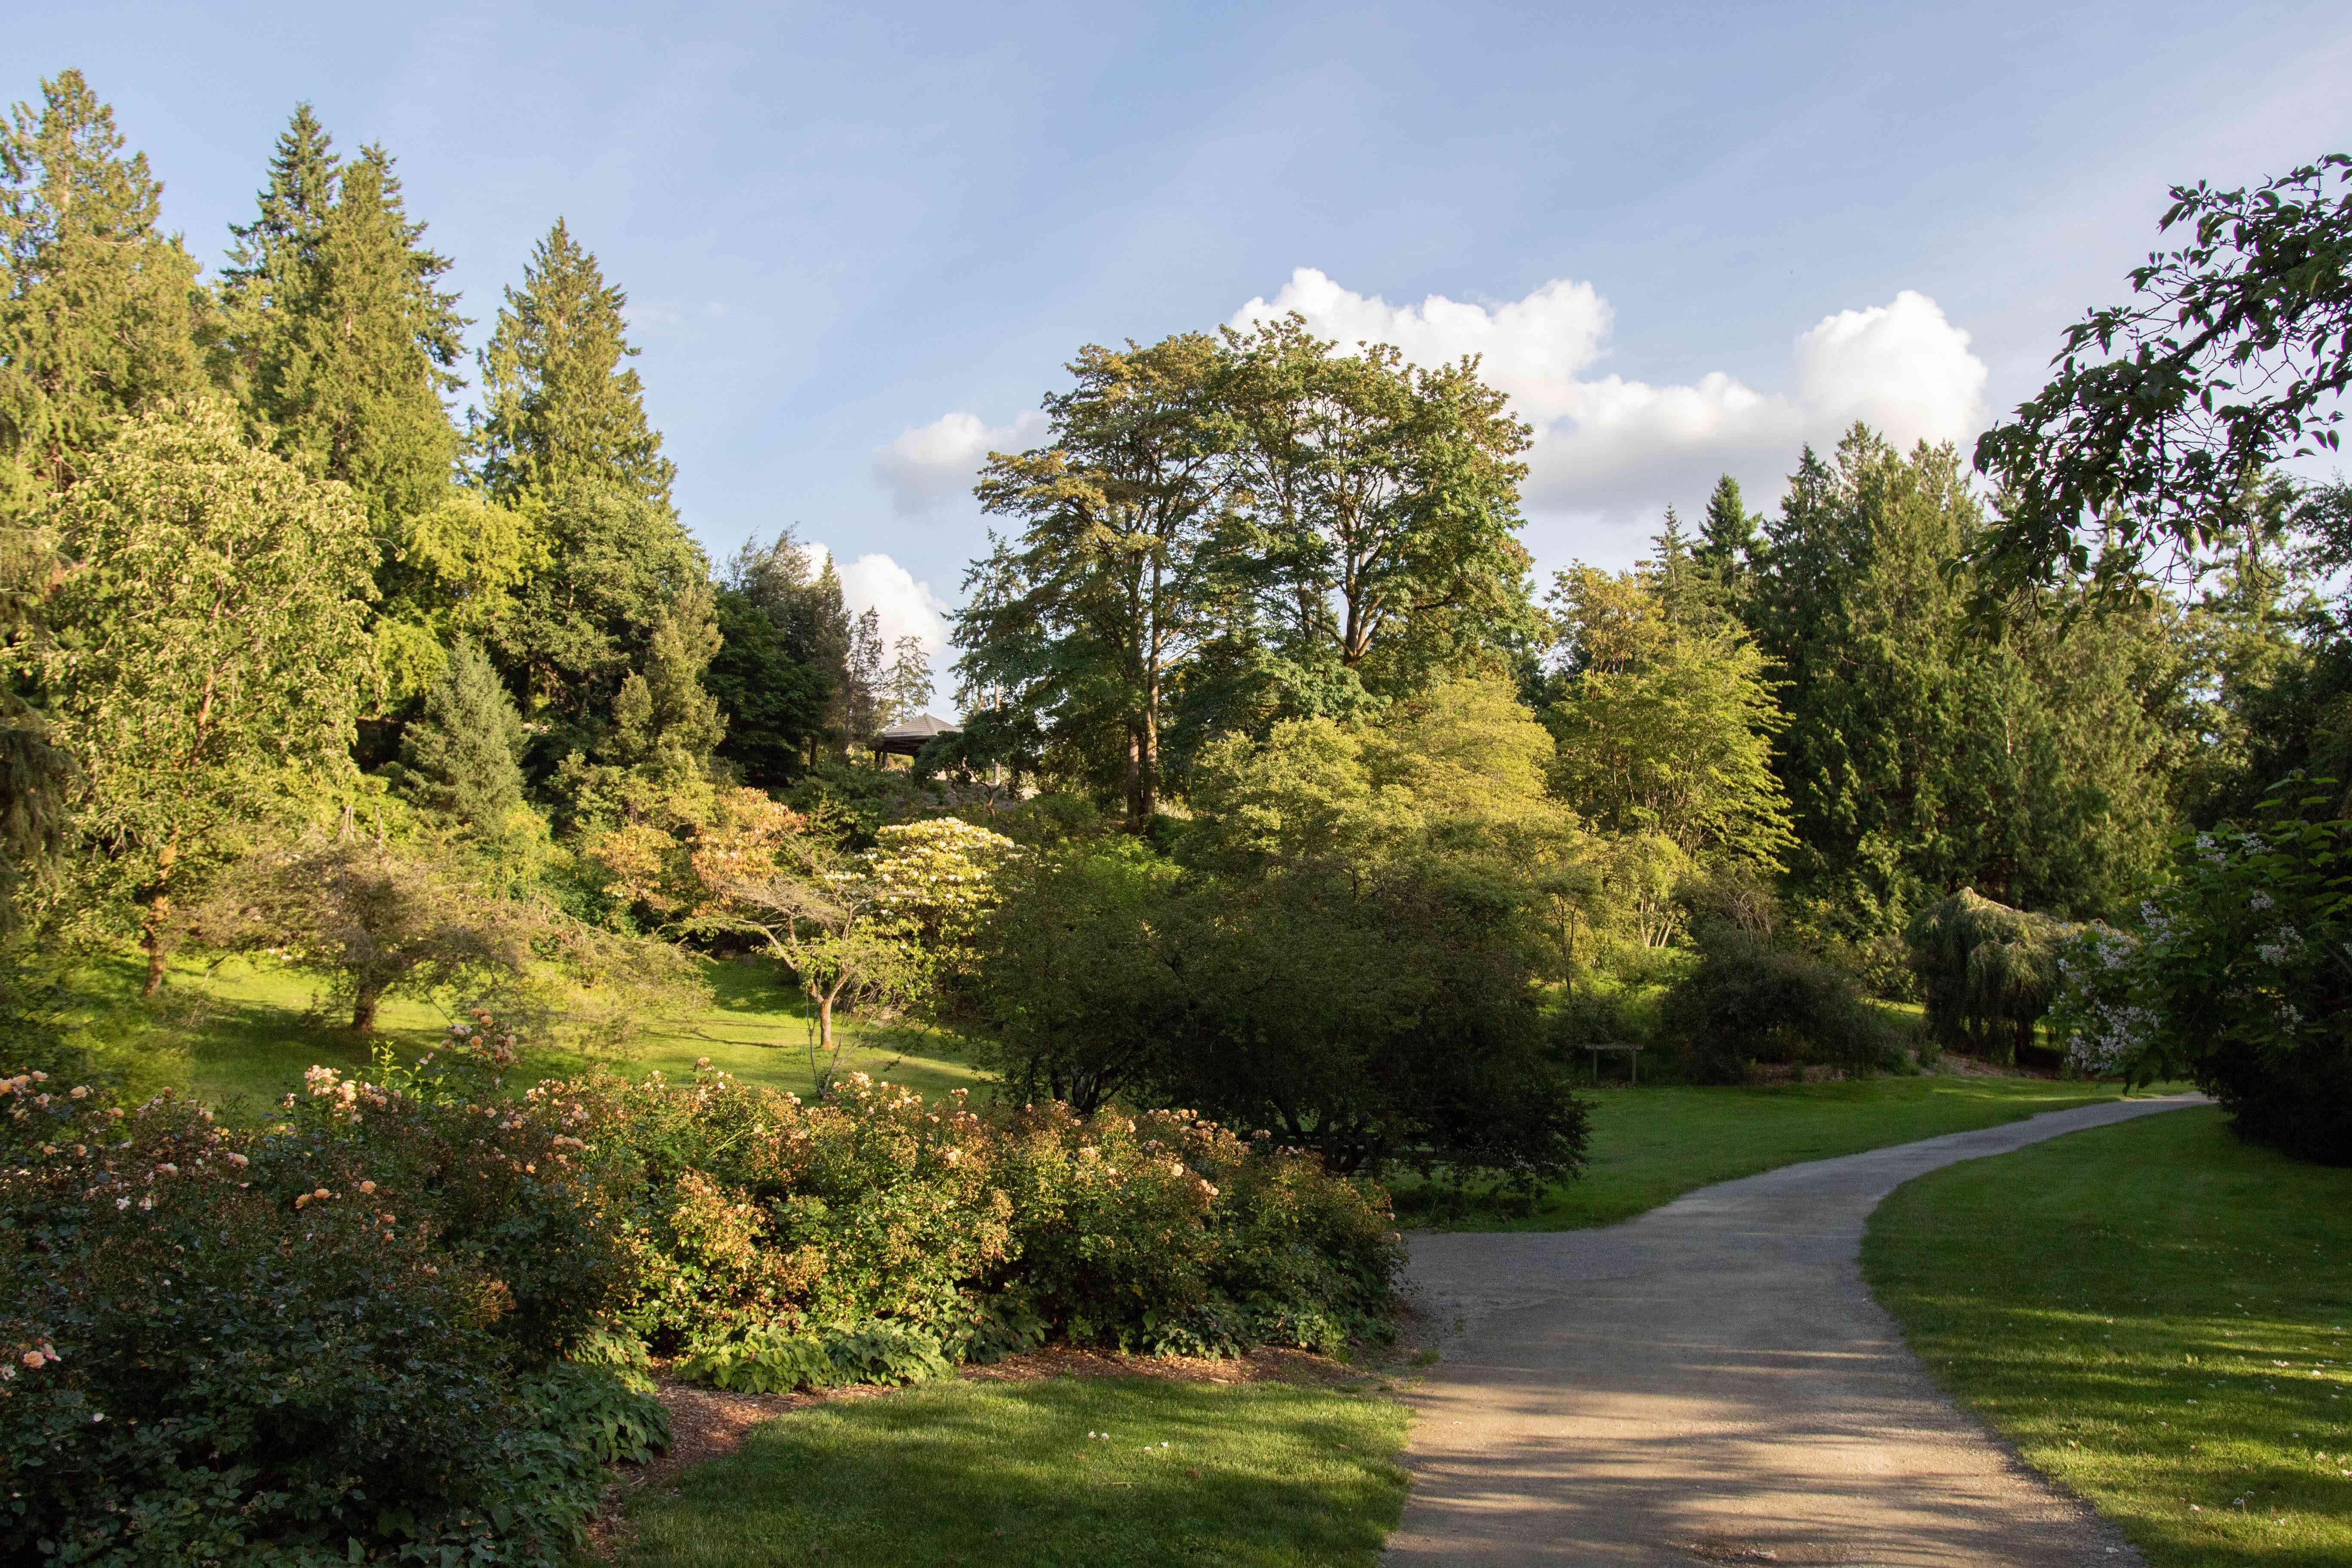 Washington Park Arboretum in Seattle